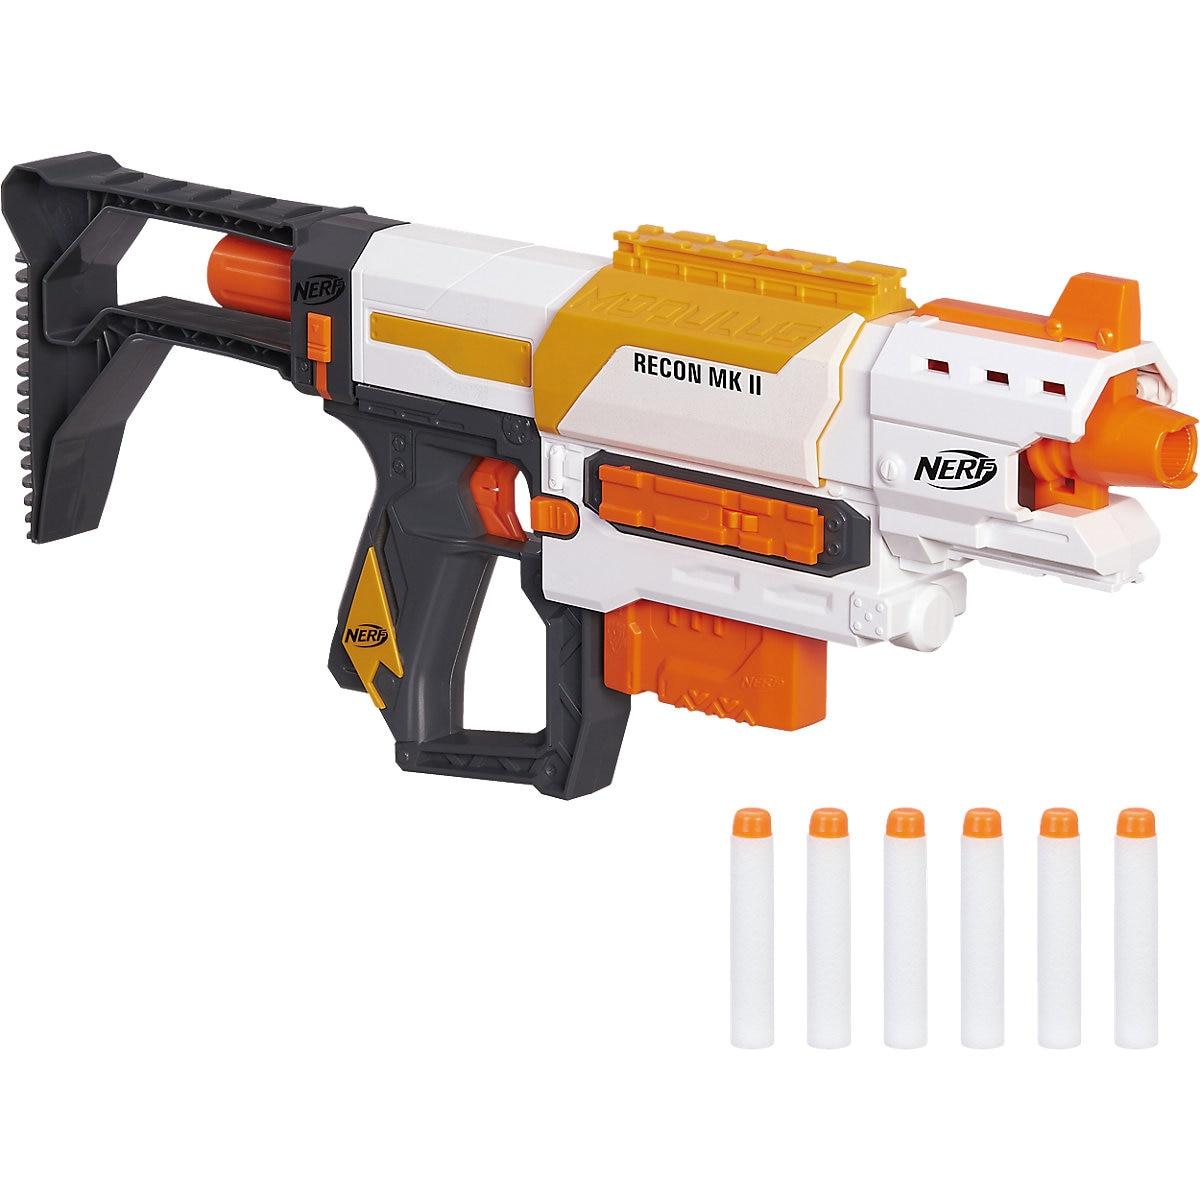 NERF Toy Guns 4326309 gun weapon toys games pneumatic blaster boy orbiz revolver Outdoor Fun Sports MTpromo